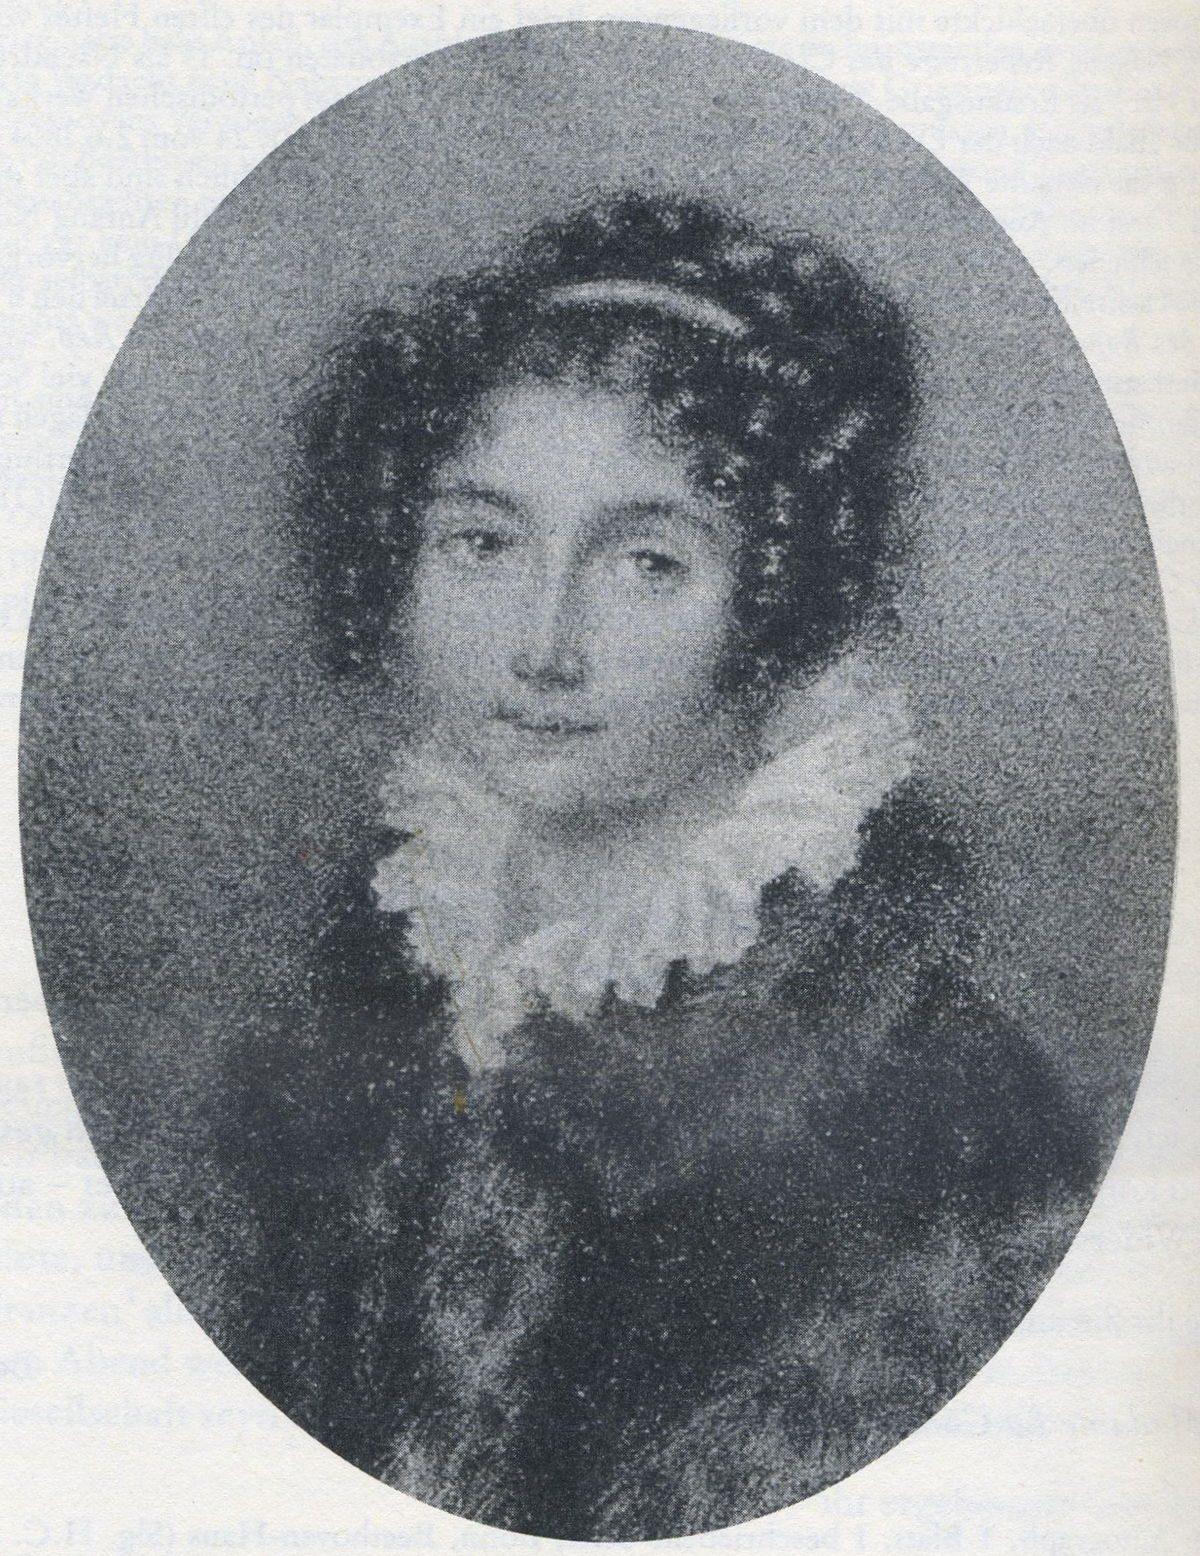 Ludwig van Beethoven Beethoven - Vanilla Fudge The Vanilla Fudge Beethoven's For Elise And Moonlight Sonata